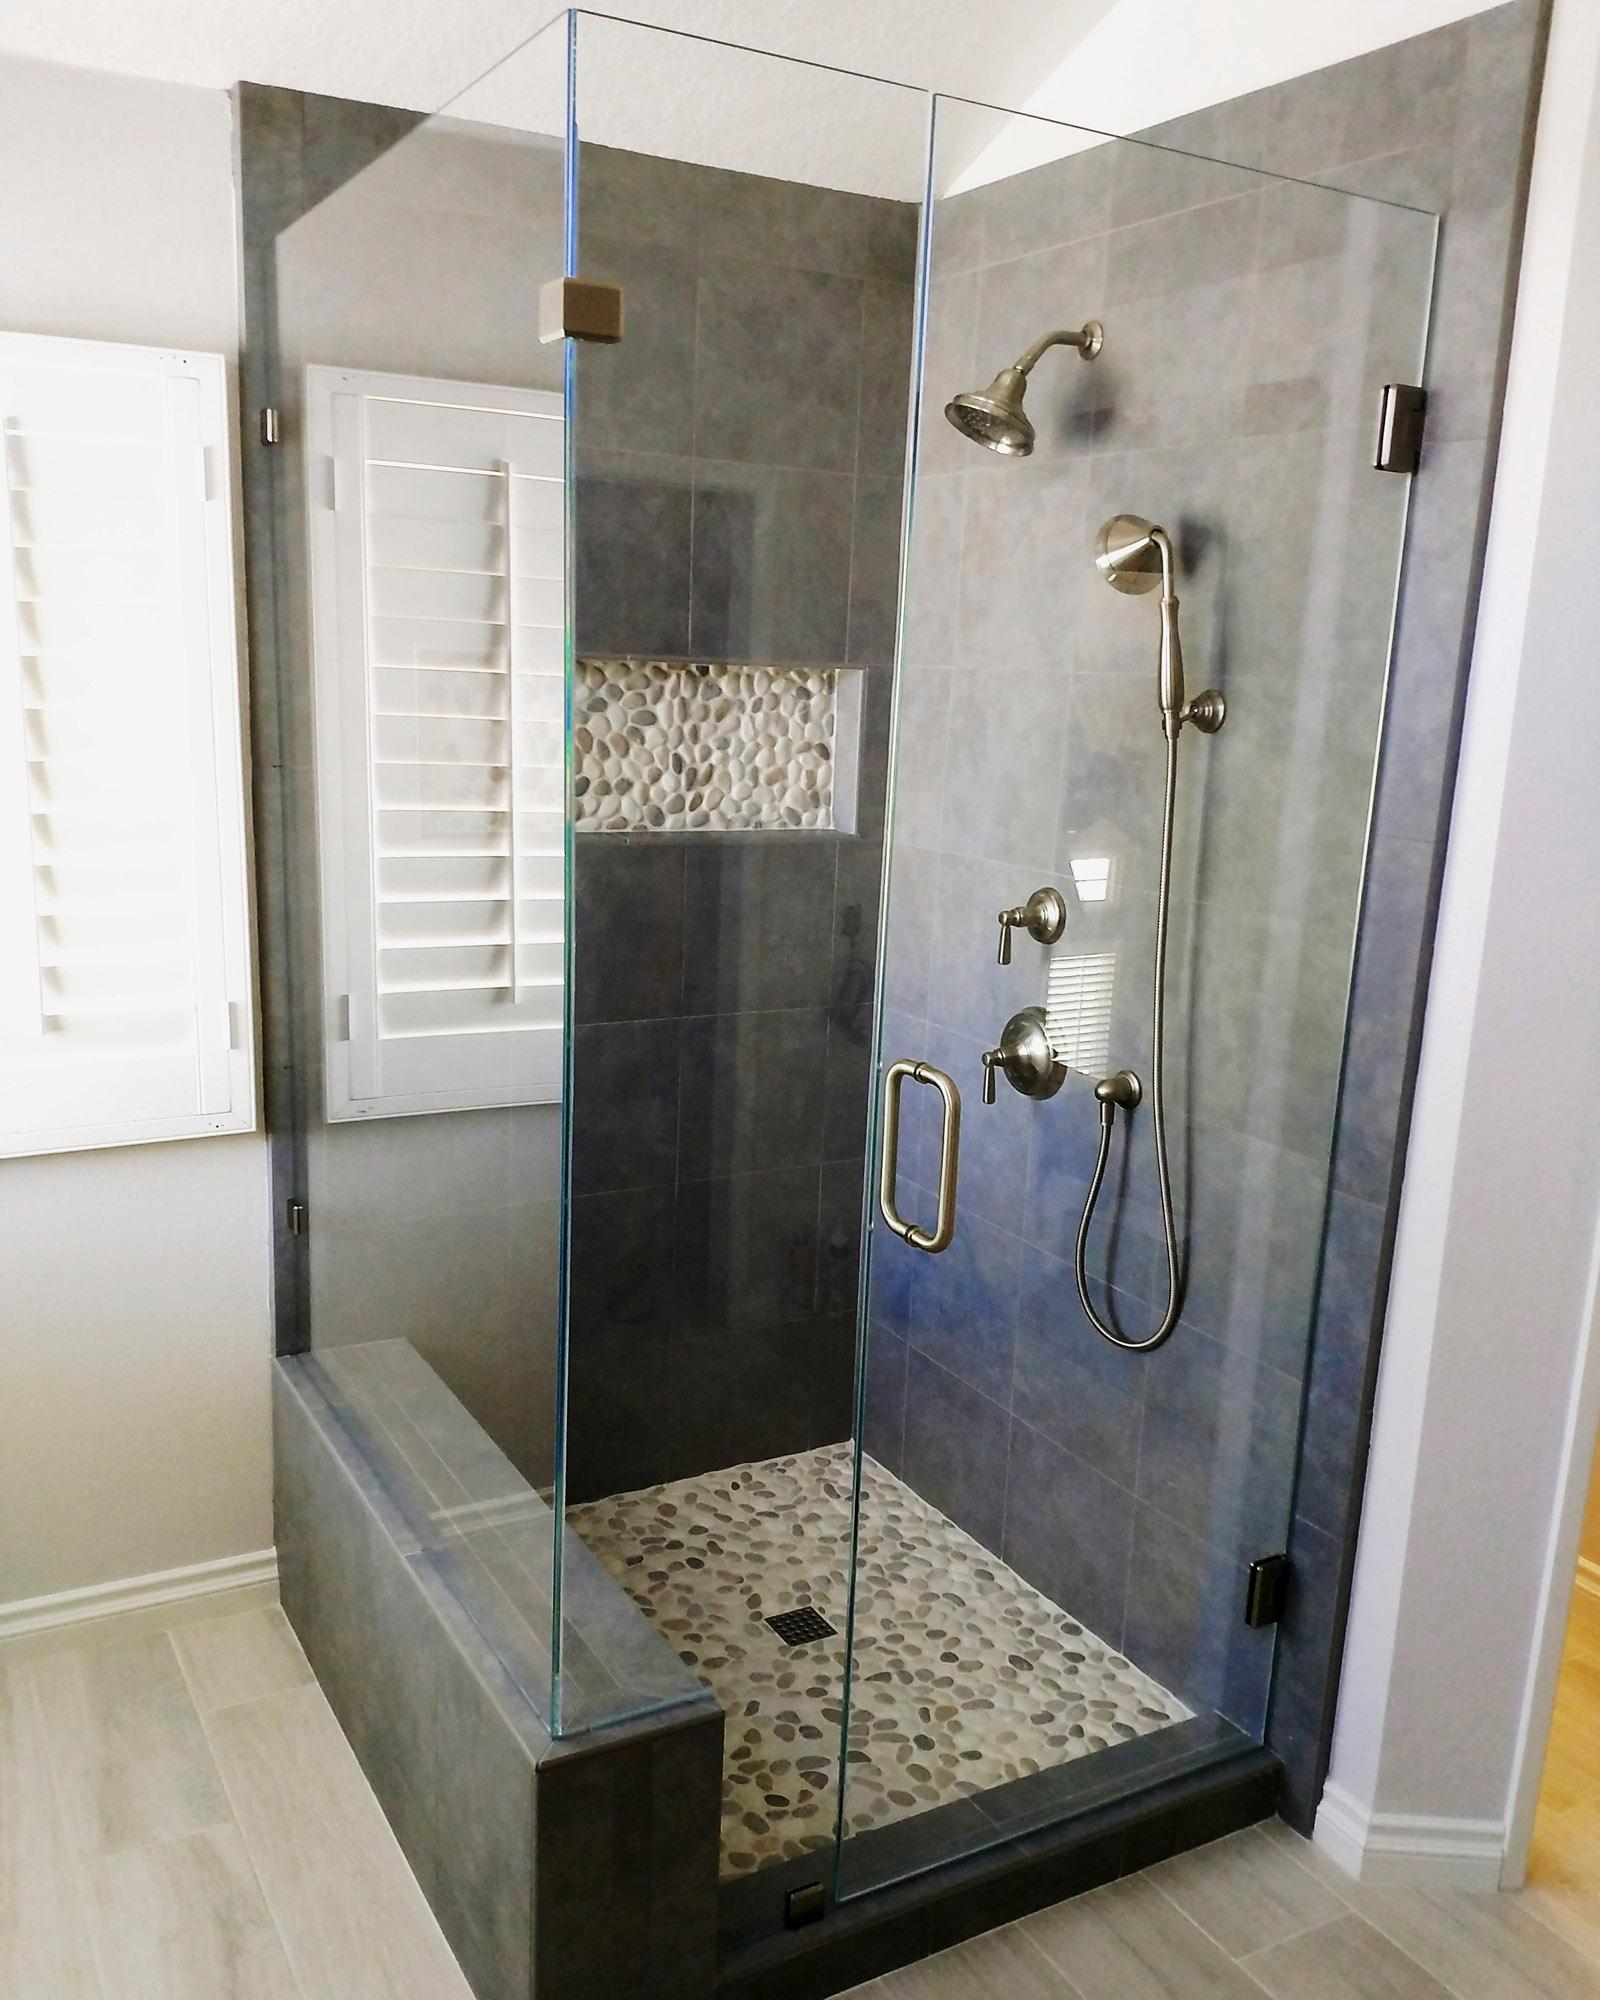 90 Degree Starphire by Blizzard Frameless Showers & 90 Degree Shower Door Gallery \u2013 Blizzard Frameless